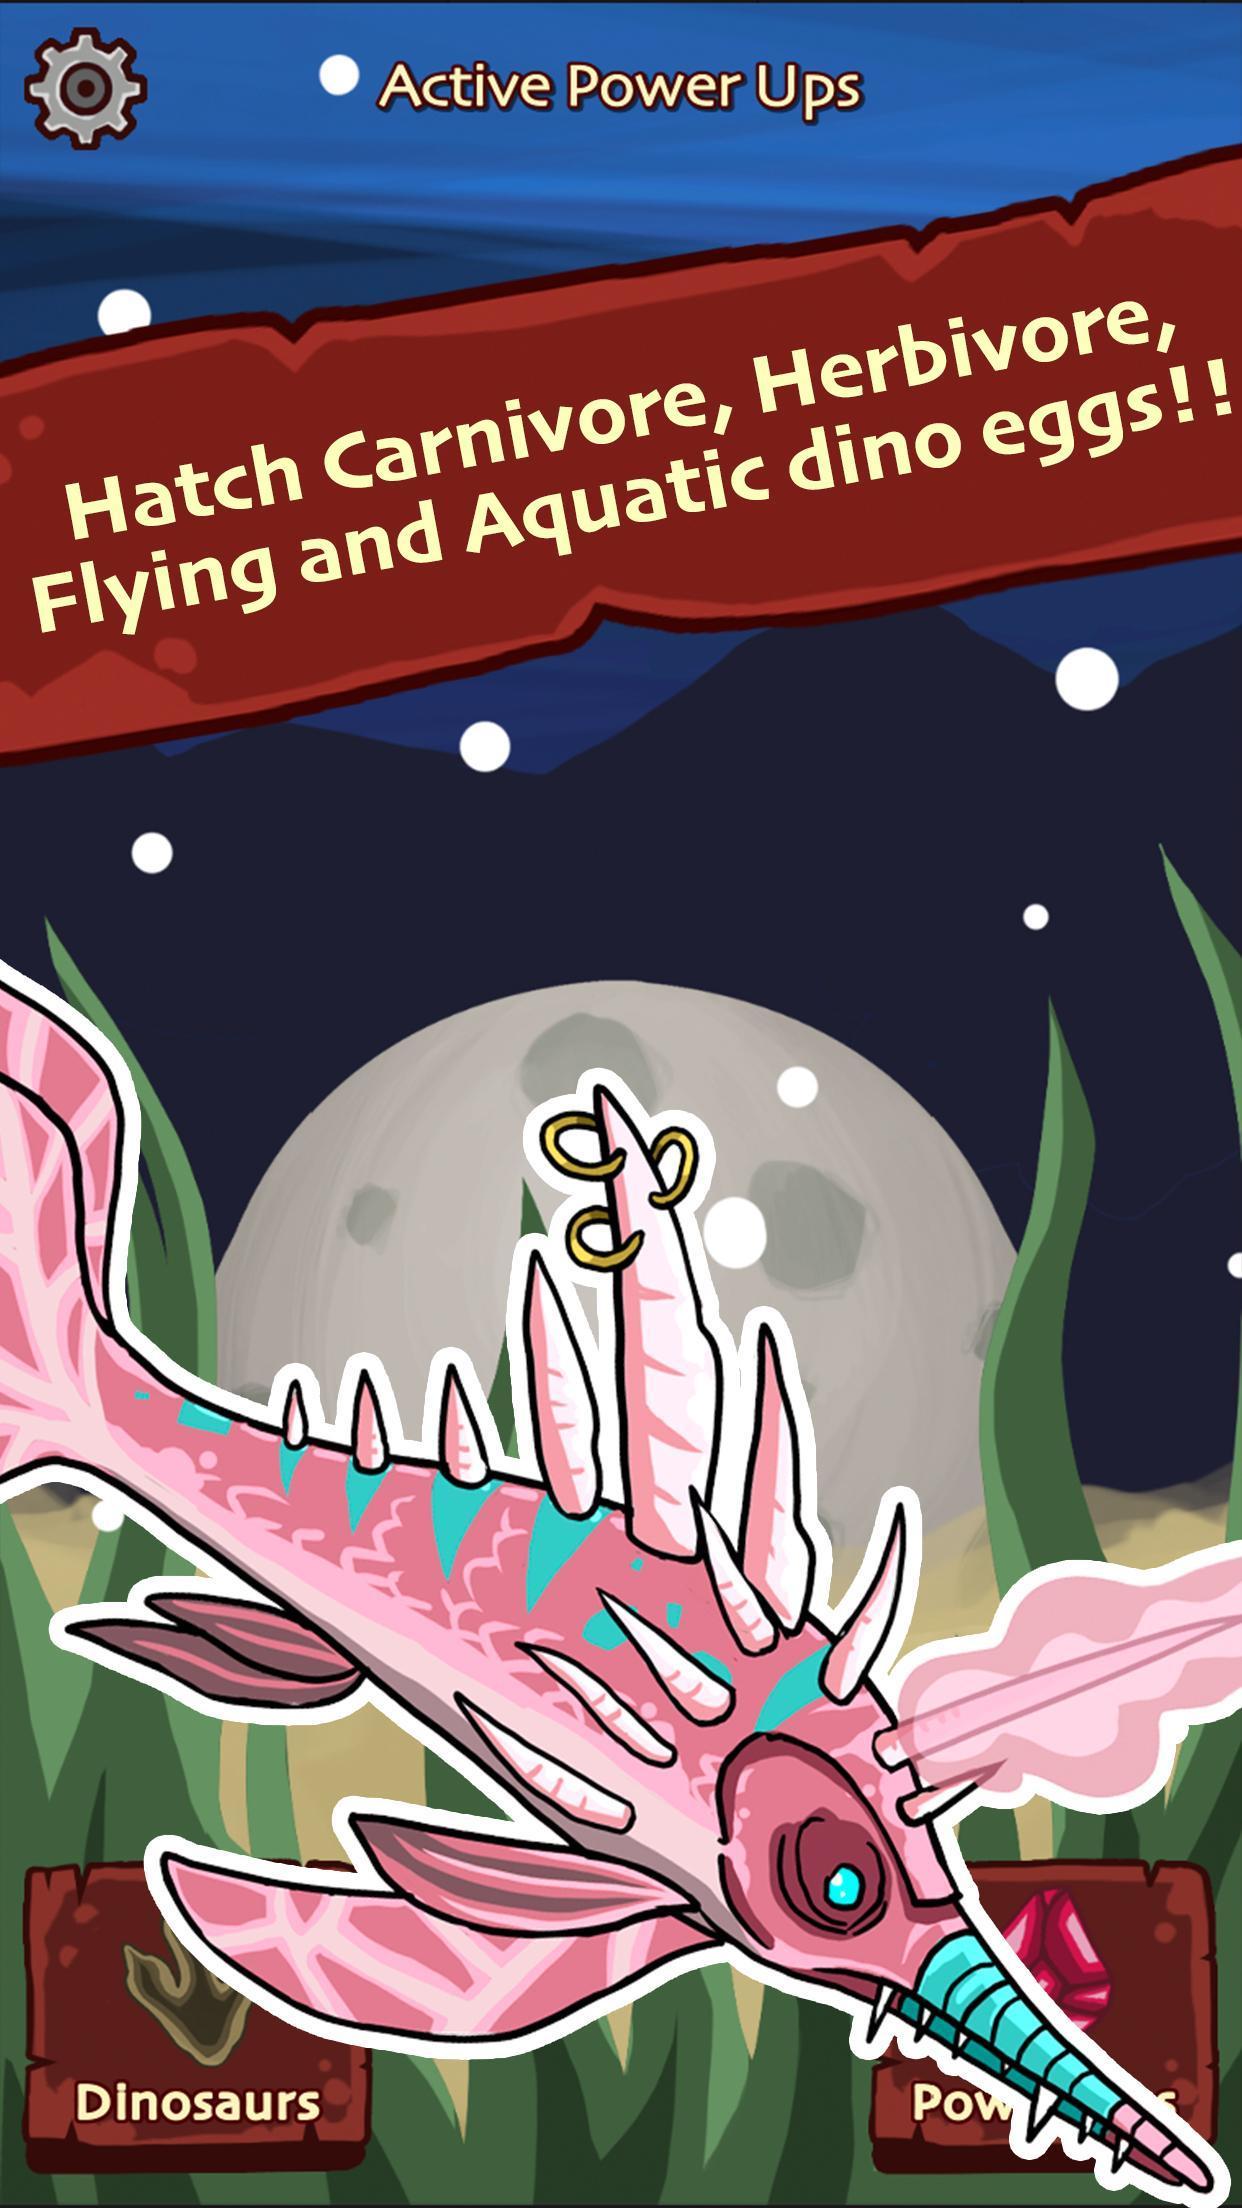 Hatch Dinosaur Eggs - Jurassic World Clicker Games 1.0.7 Screenshot 4